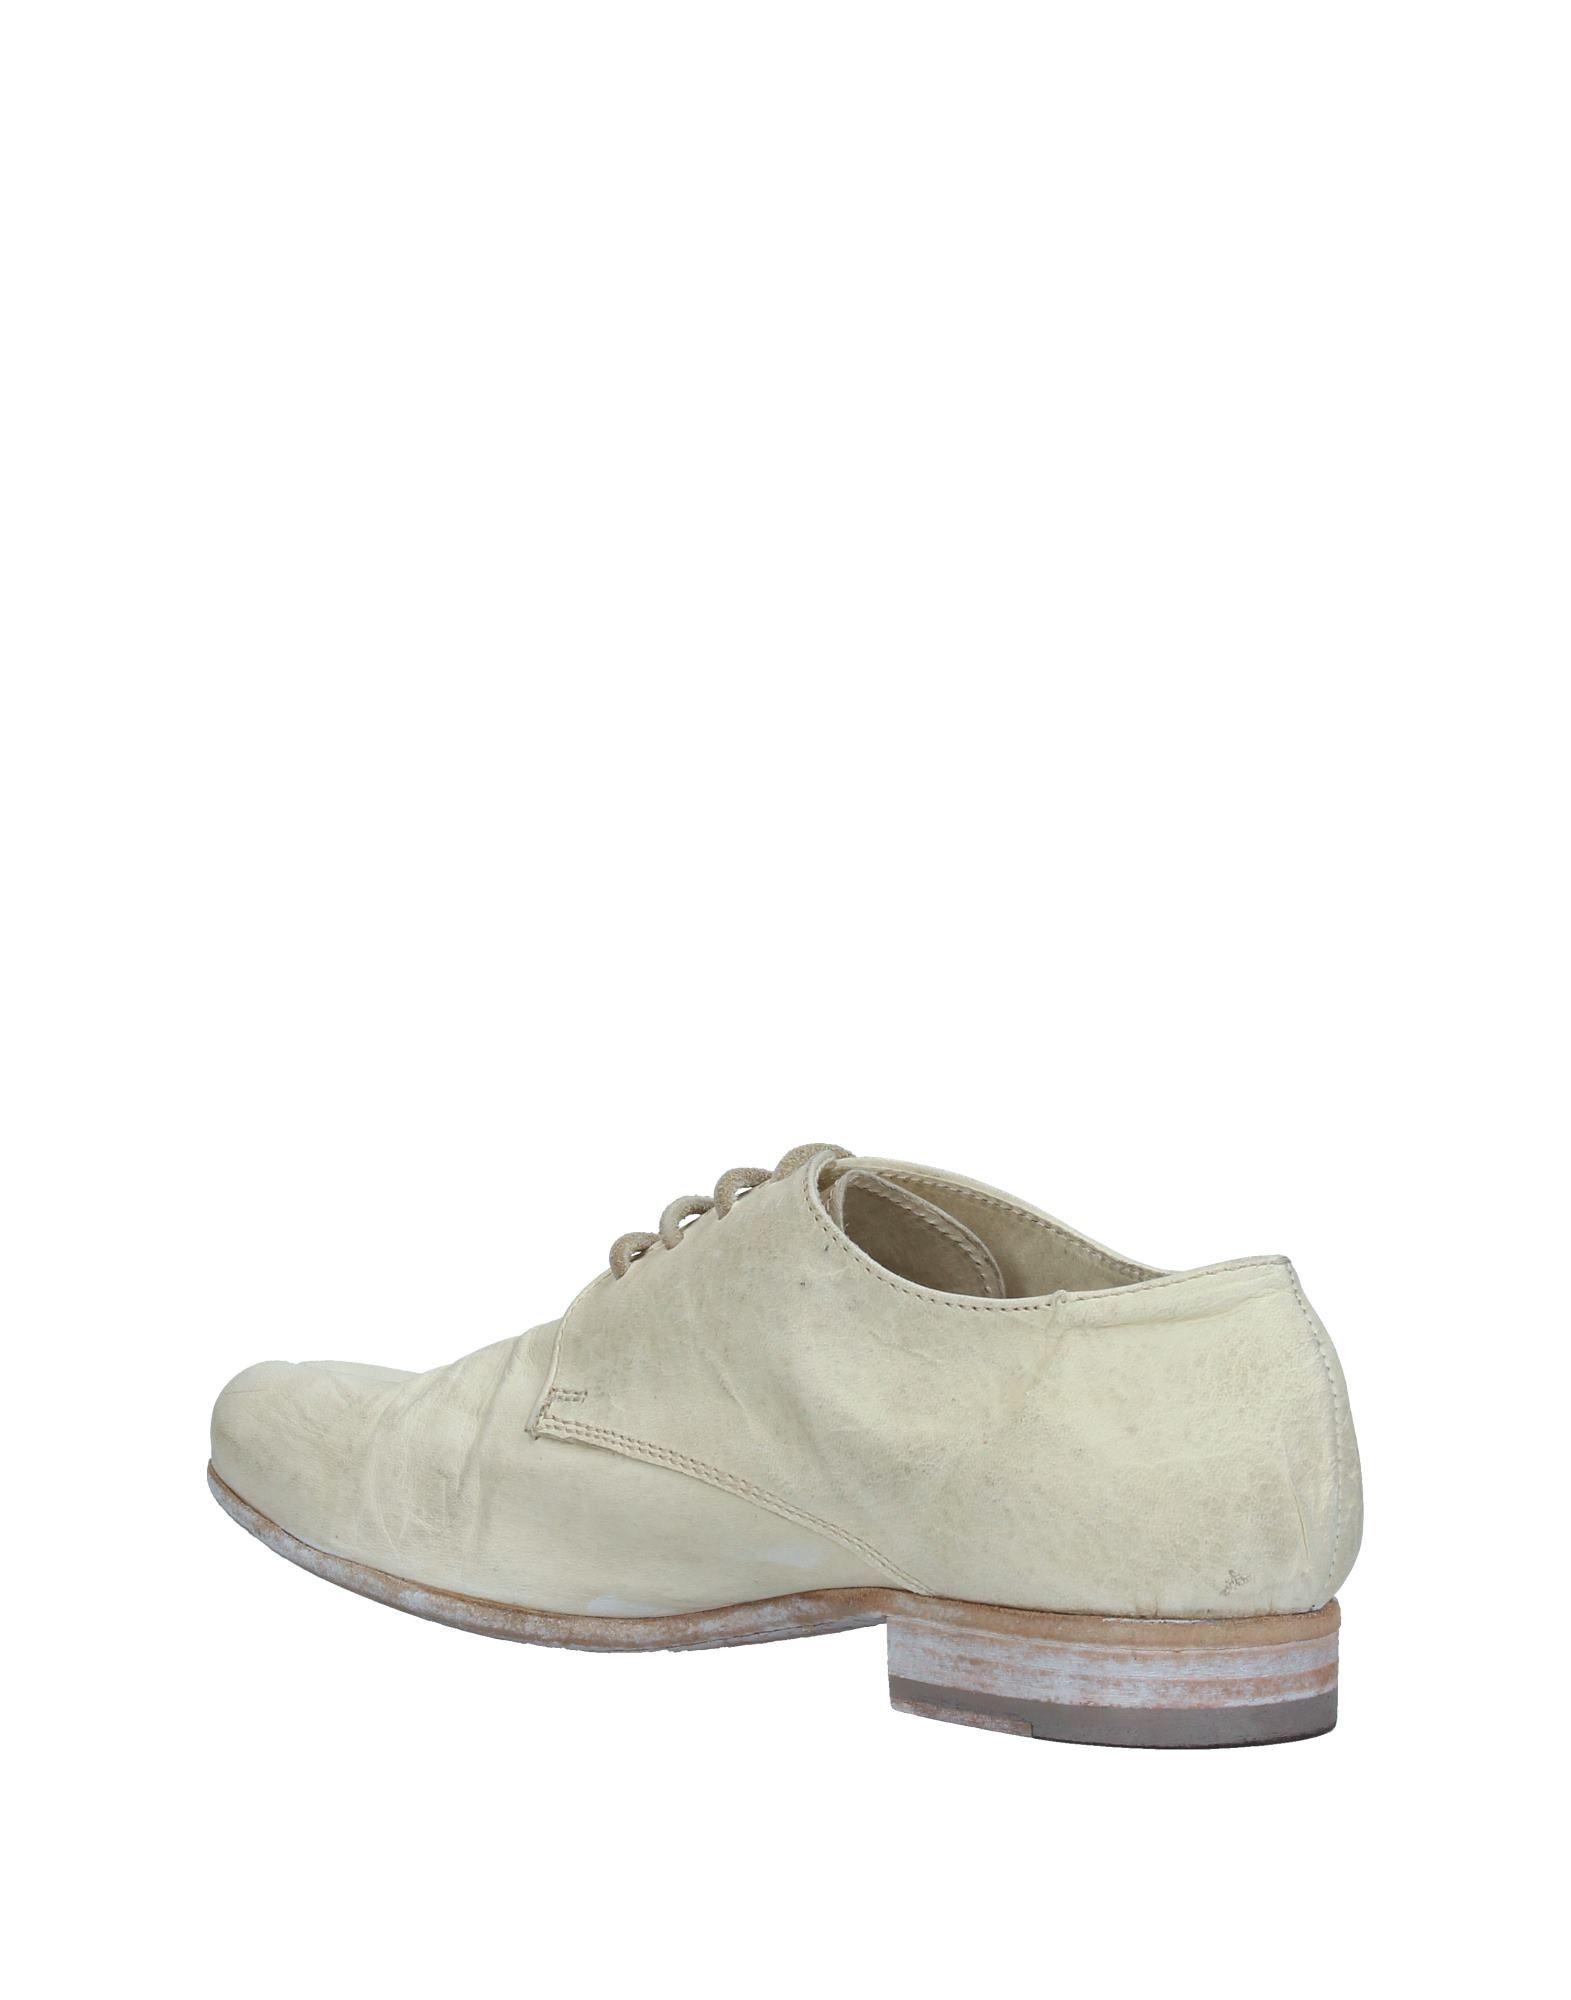 Chaussures À Lacets Giorgio Brato Femme - Chaussures À Lacets Giorgio Brato sur